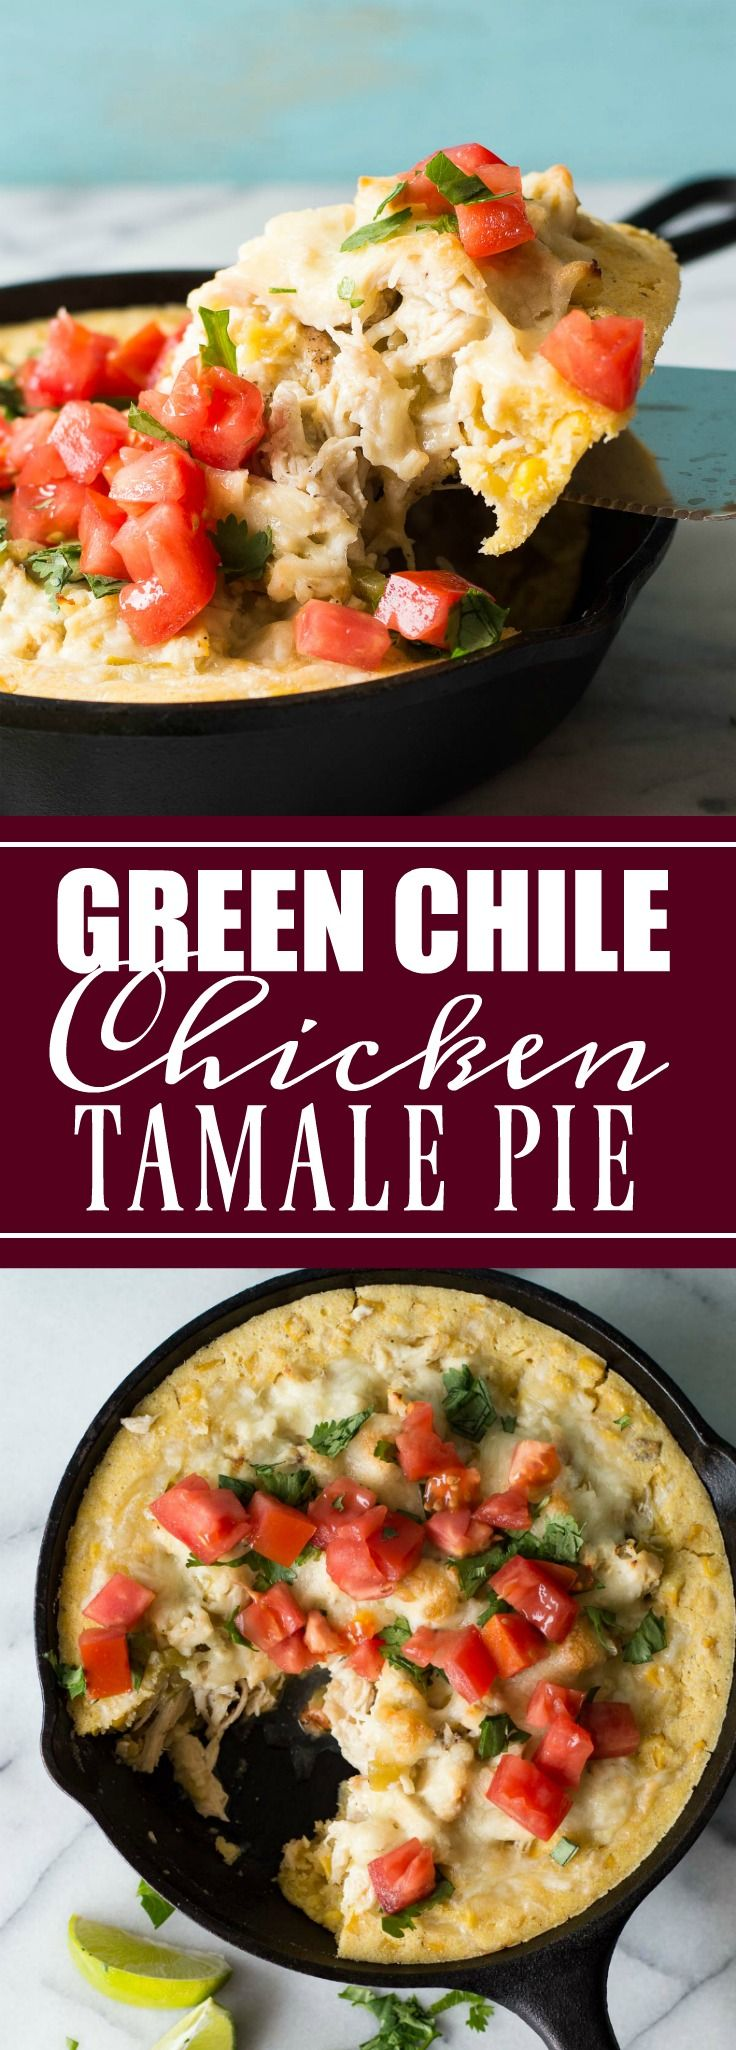 Green Chile Chicken Tamale Pie